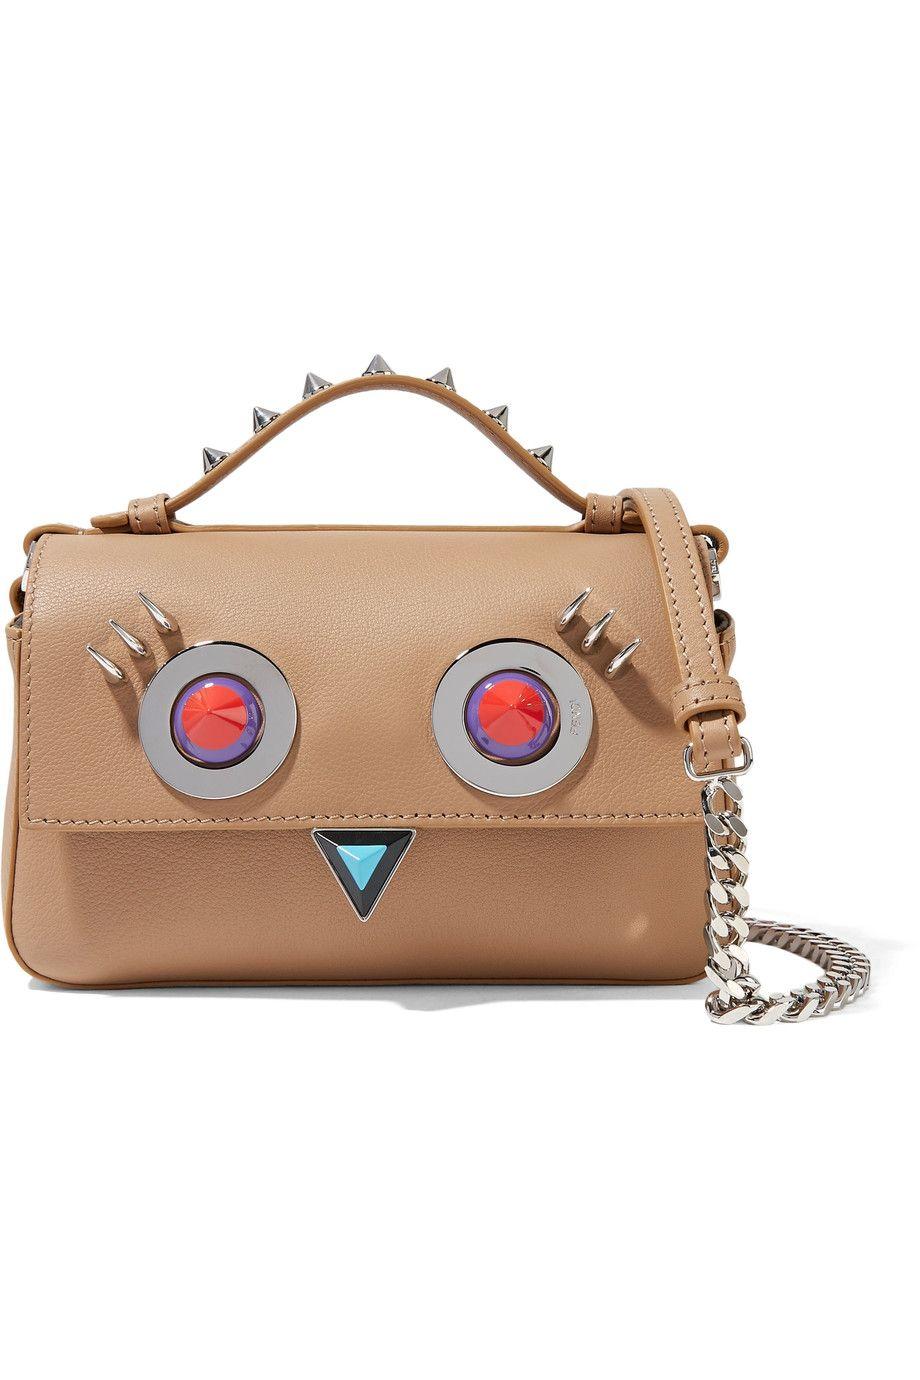 FENDI Double Baguette micro embellished leather shoulder bag ... 2ca6b6bb7fd